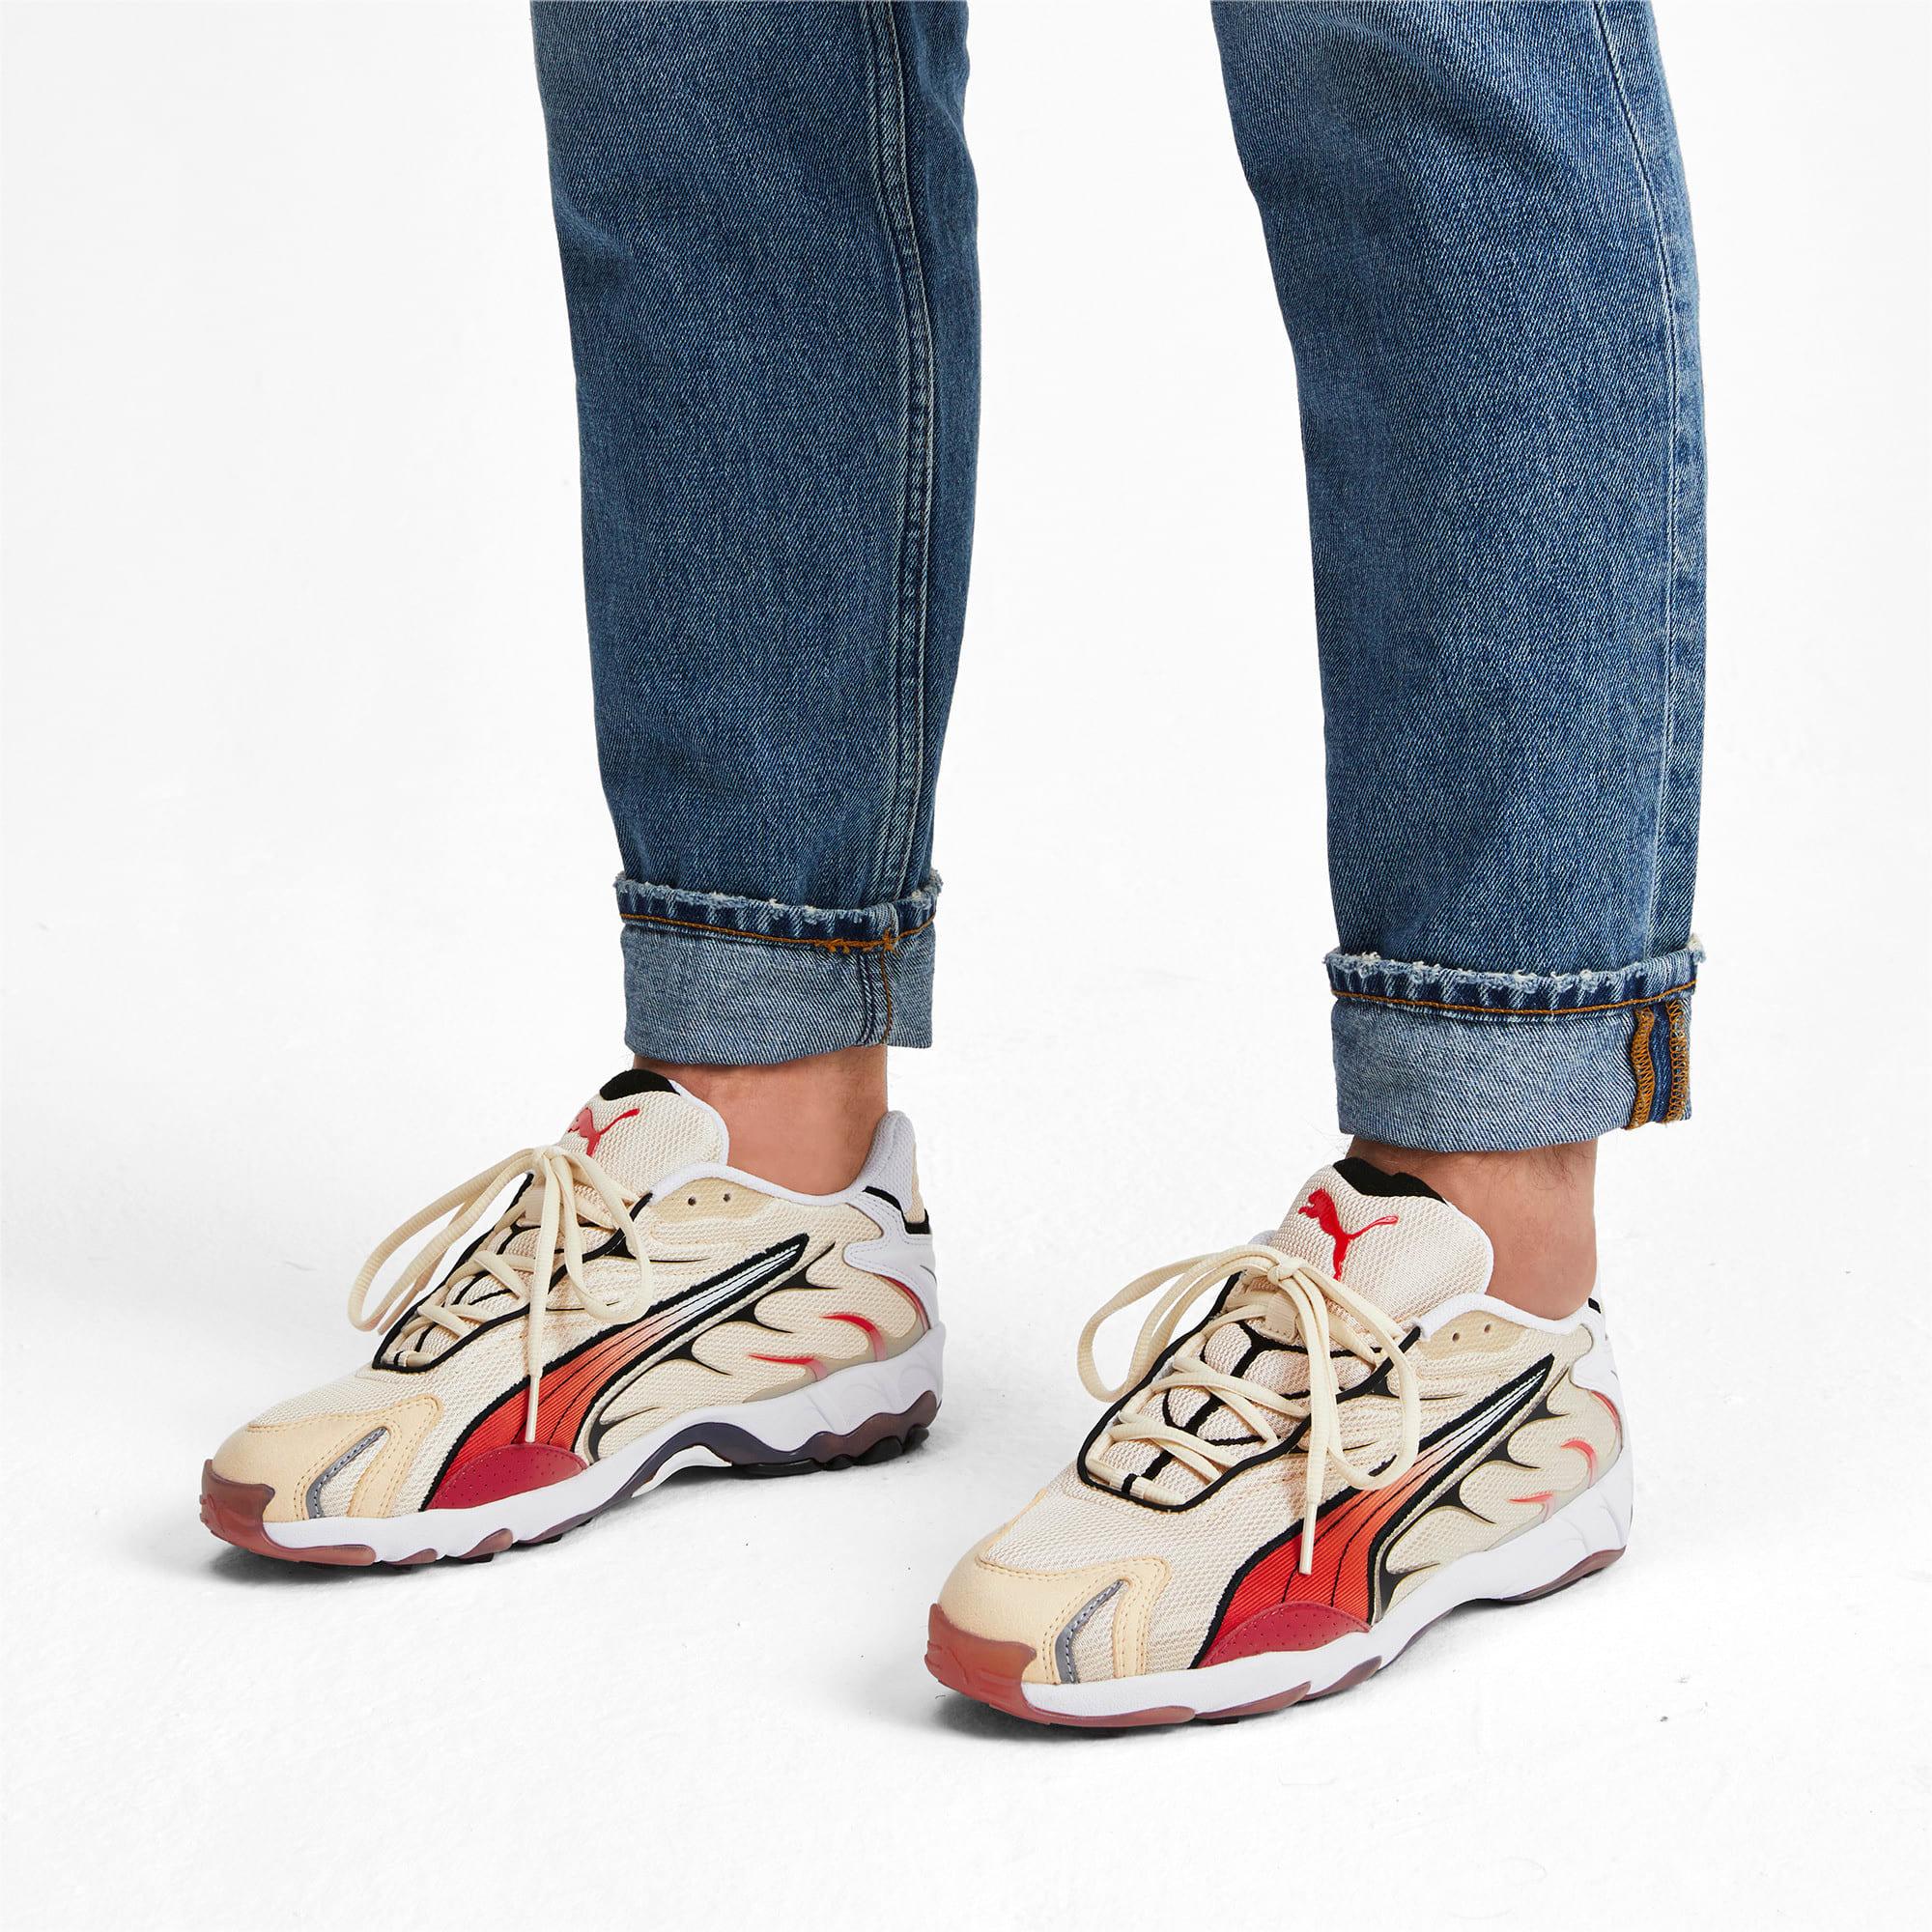 Thumbnail 2 of Inhale Sneakers, Summer Melon-High Risk Red, medium